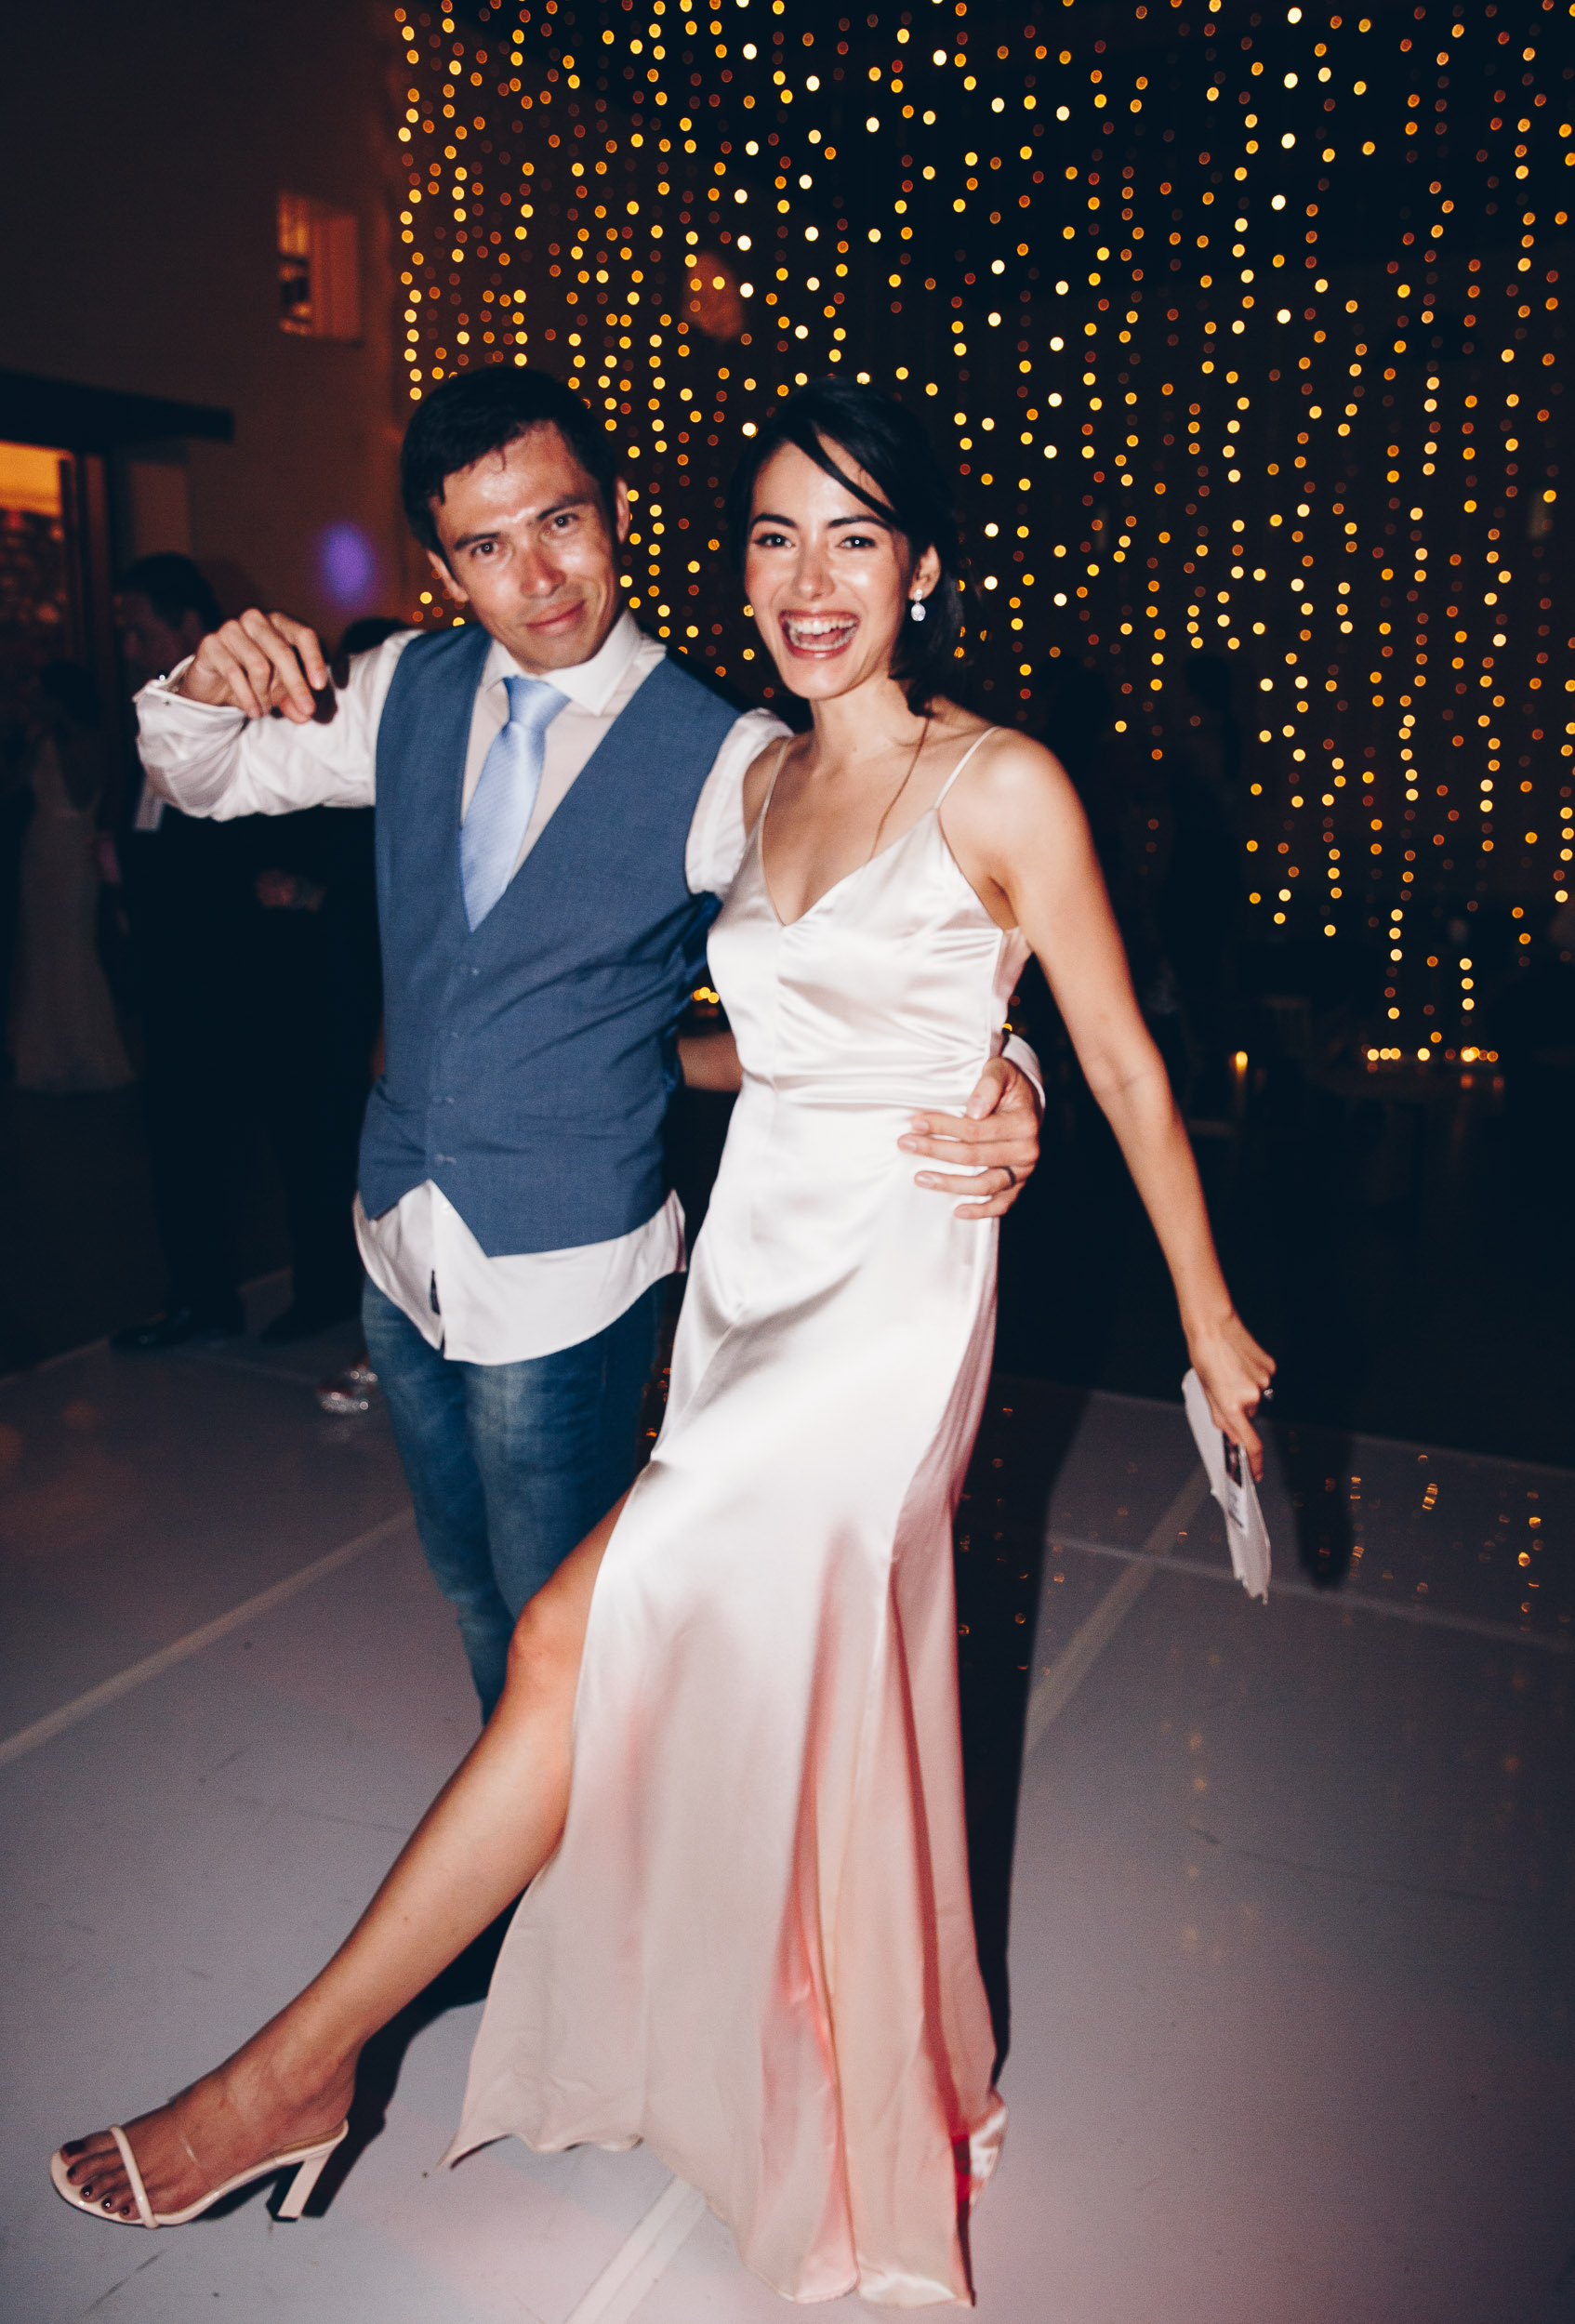 Jenny-Rockett-John-Scranton-Cape-Town-Wedding-Photographer-Andrea-Kellan-238.jpg